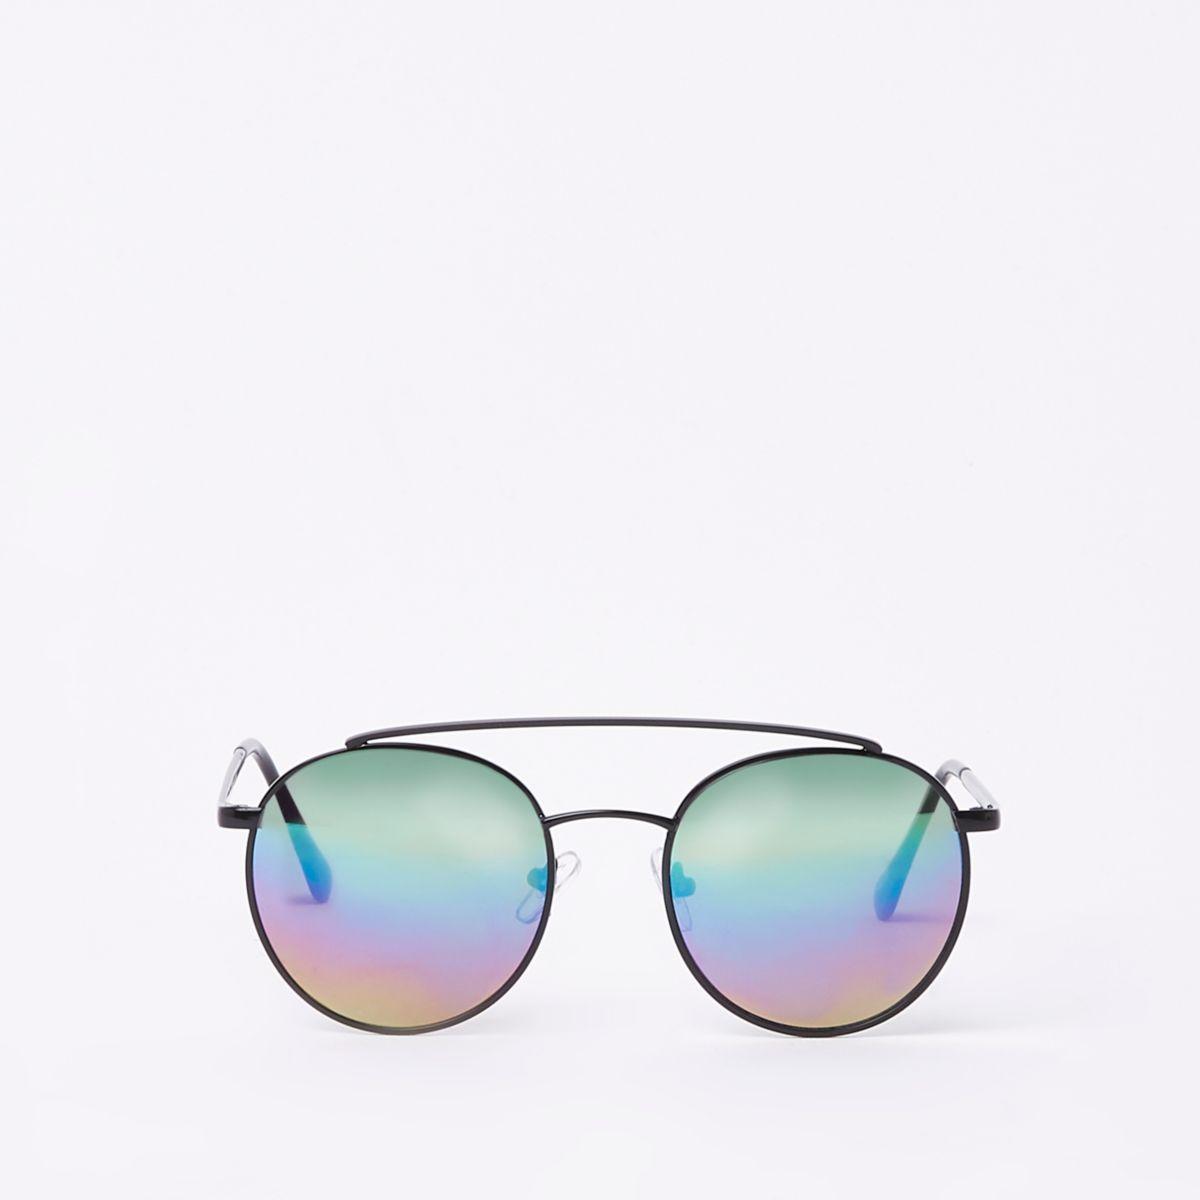 Boys black round rainbow tinted sunglasses